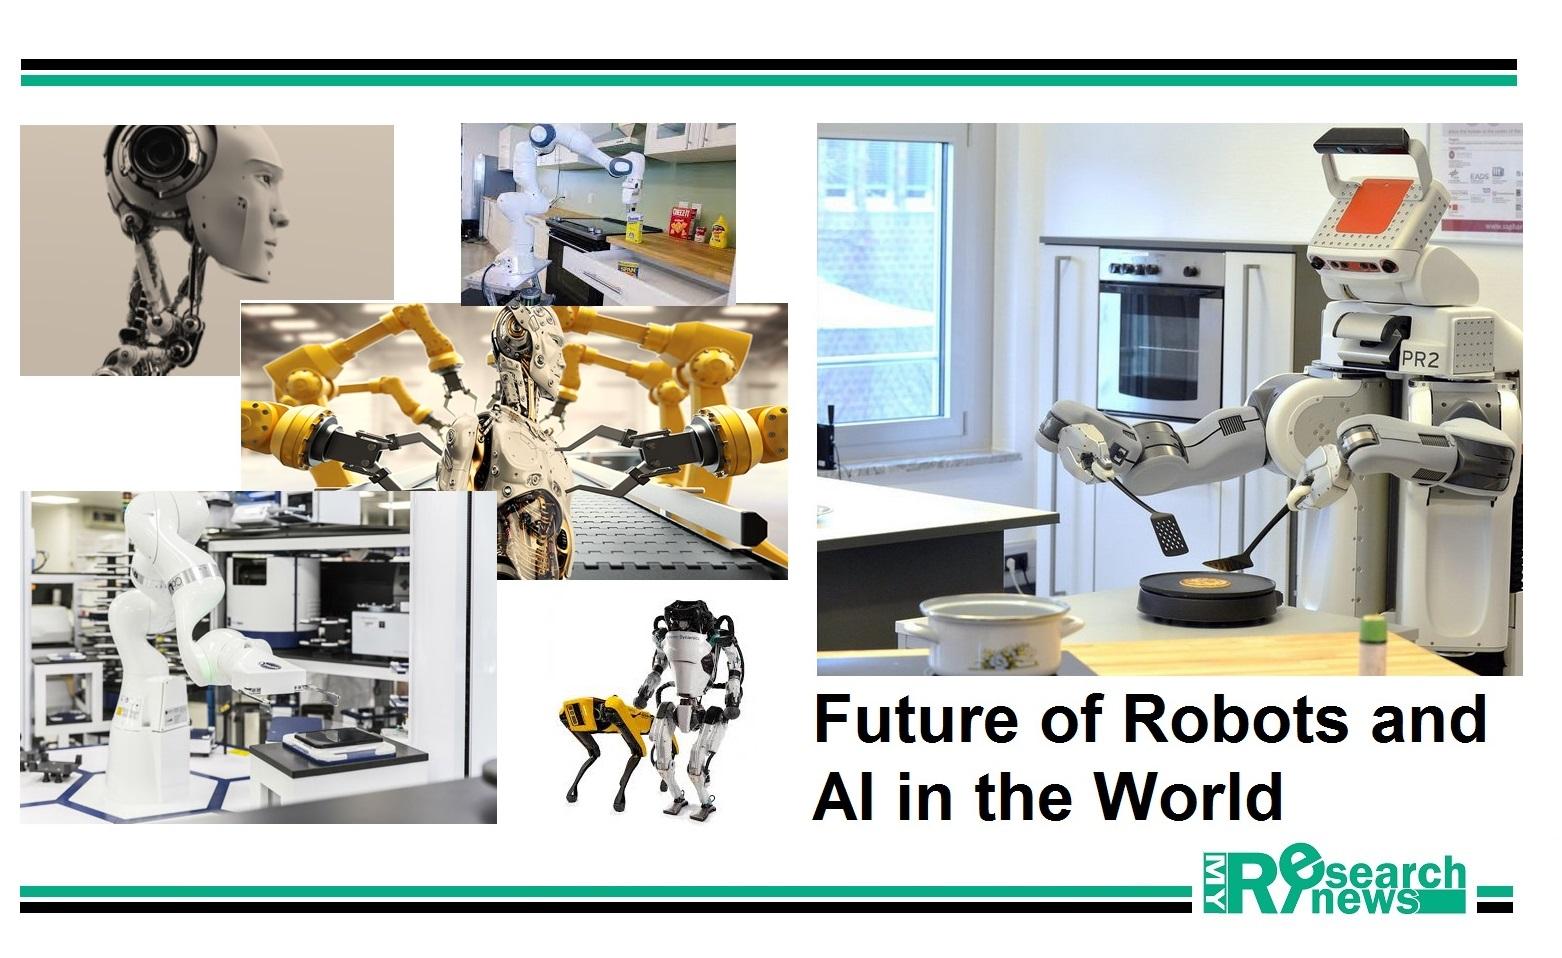 Applications of Robots